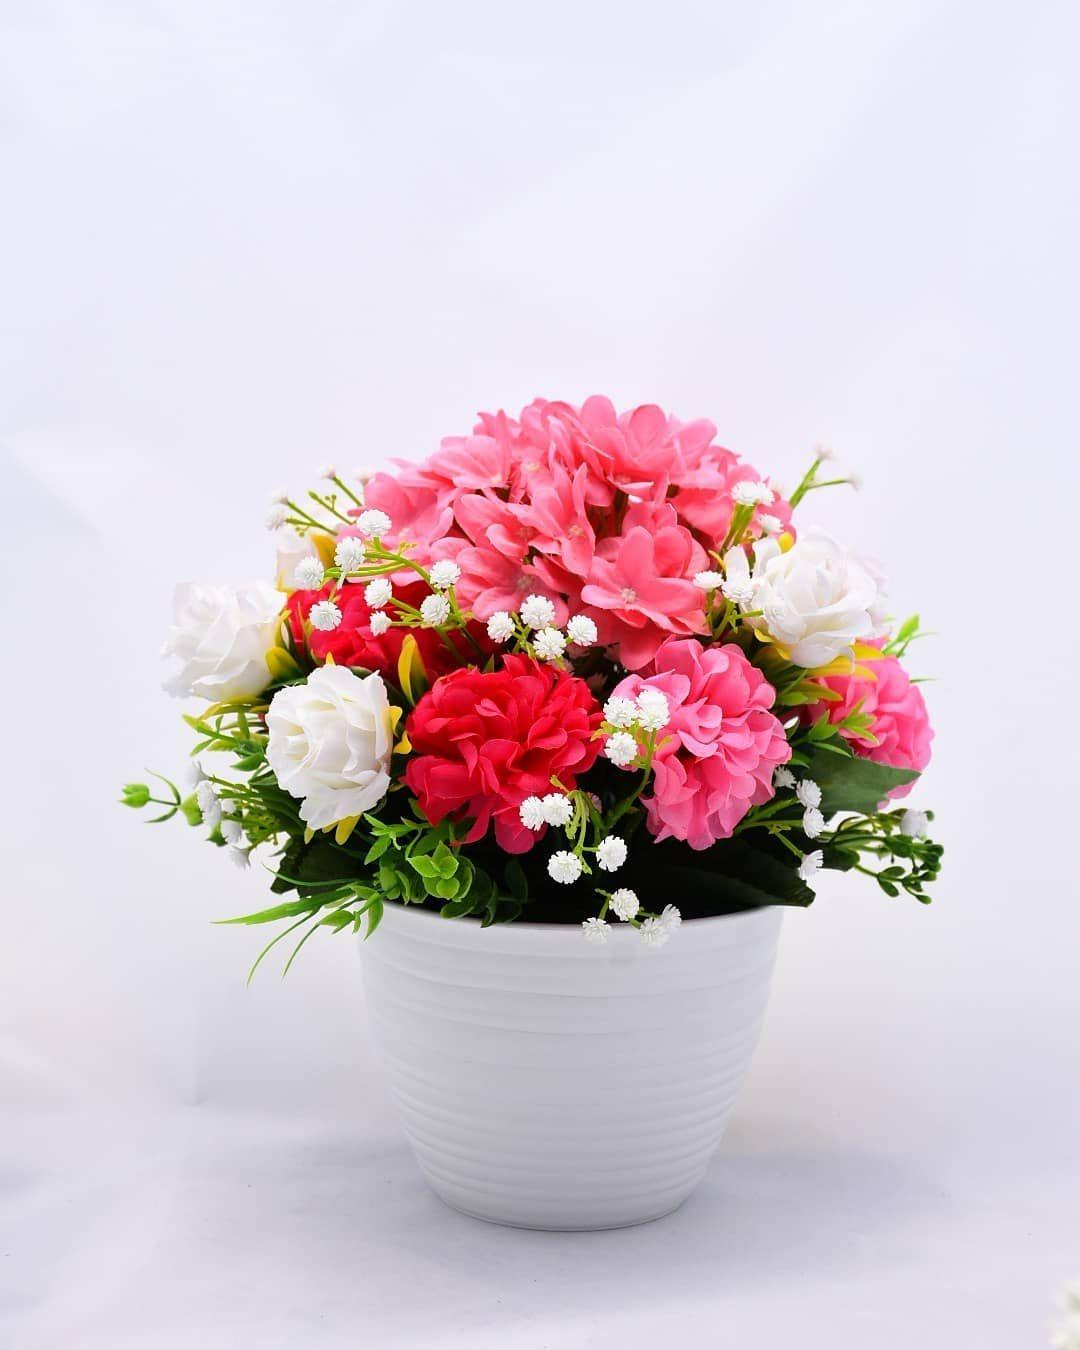 New The 10 Best Home Decor With Pictures Buket Bunga Meja Pom Pom Mawar Hydrangea Vas Tawon T15 Tinggi 30cm Rp 110 000 Bu Home Decor Decor Vase